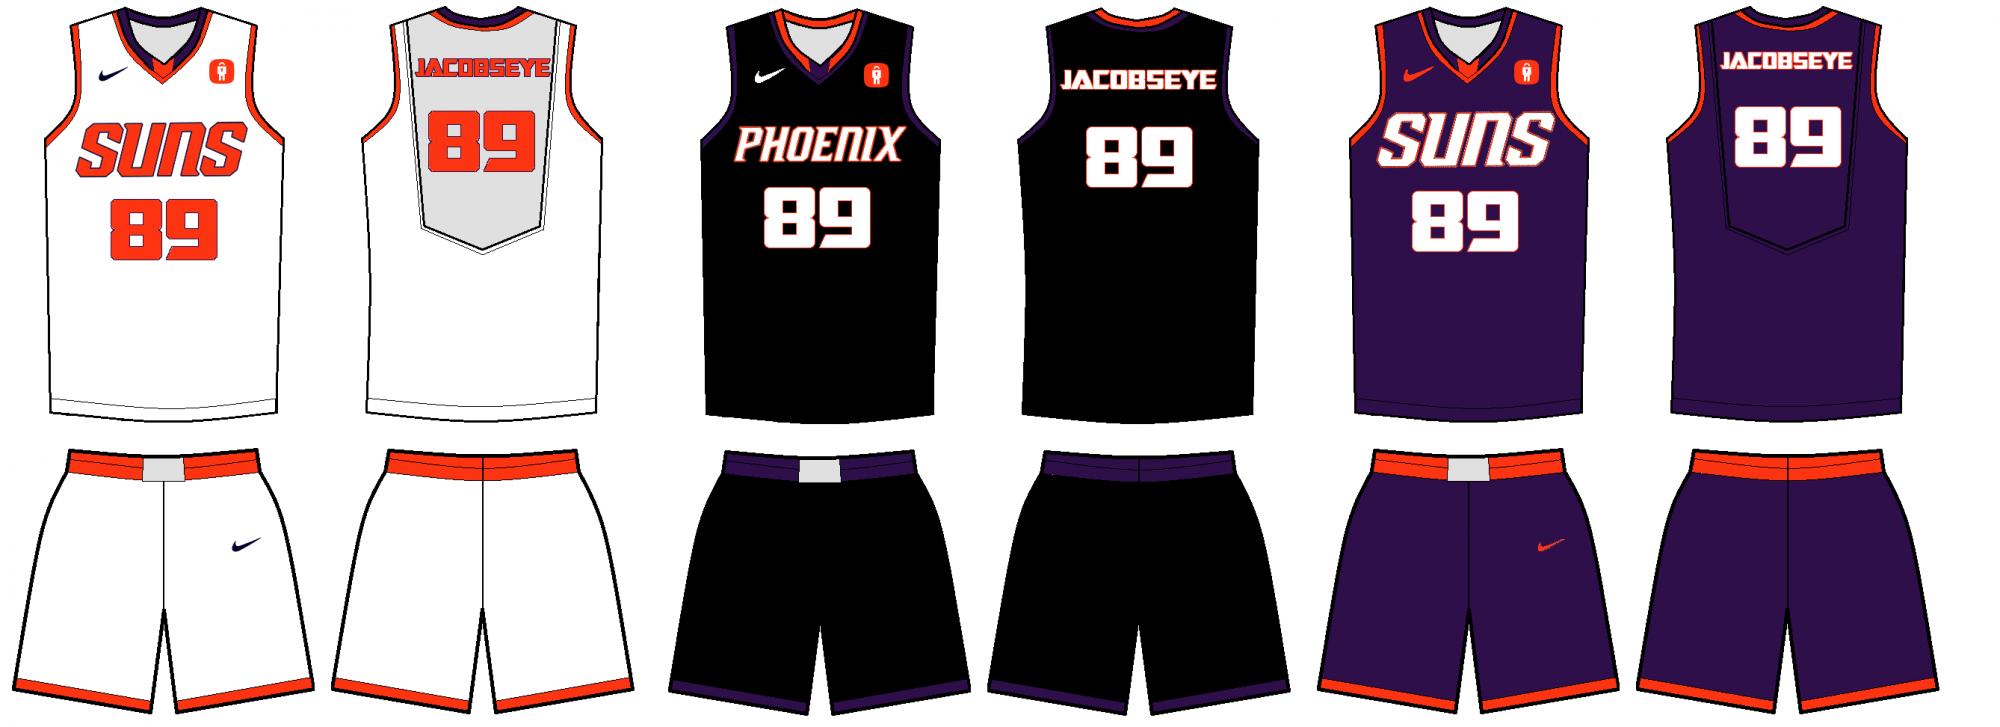 newest b9359 46383 phoenix suns concept jersey